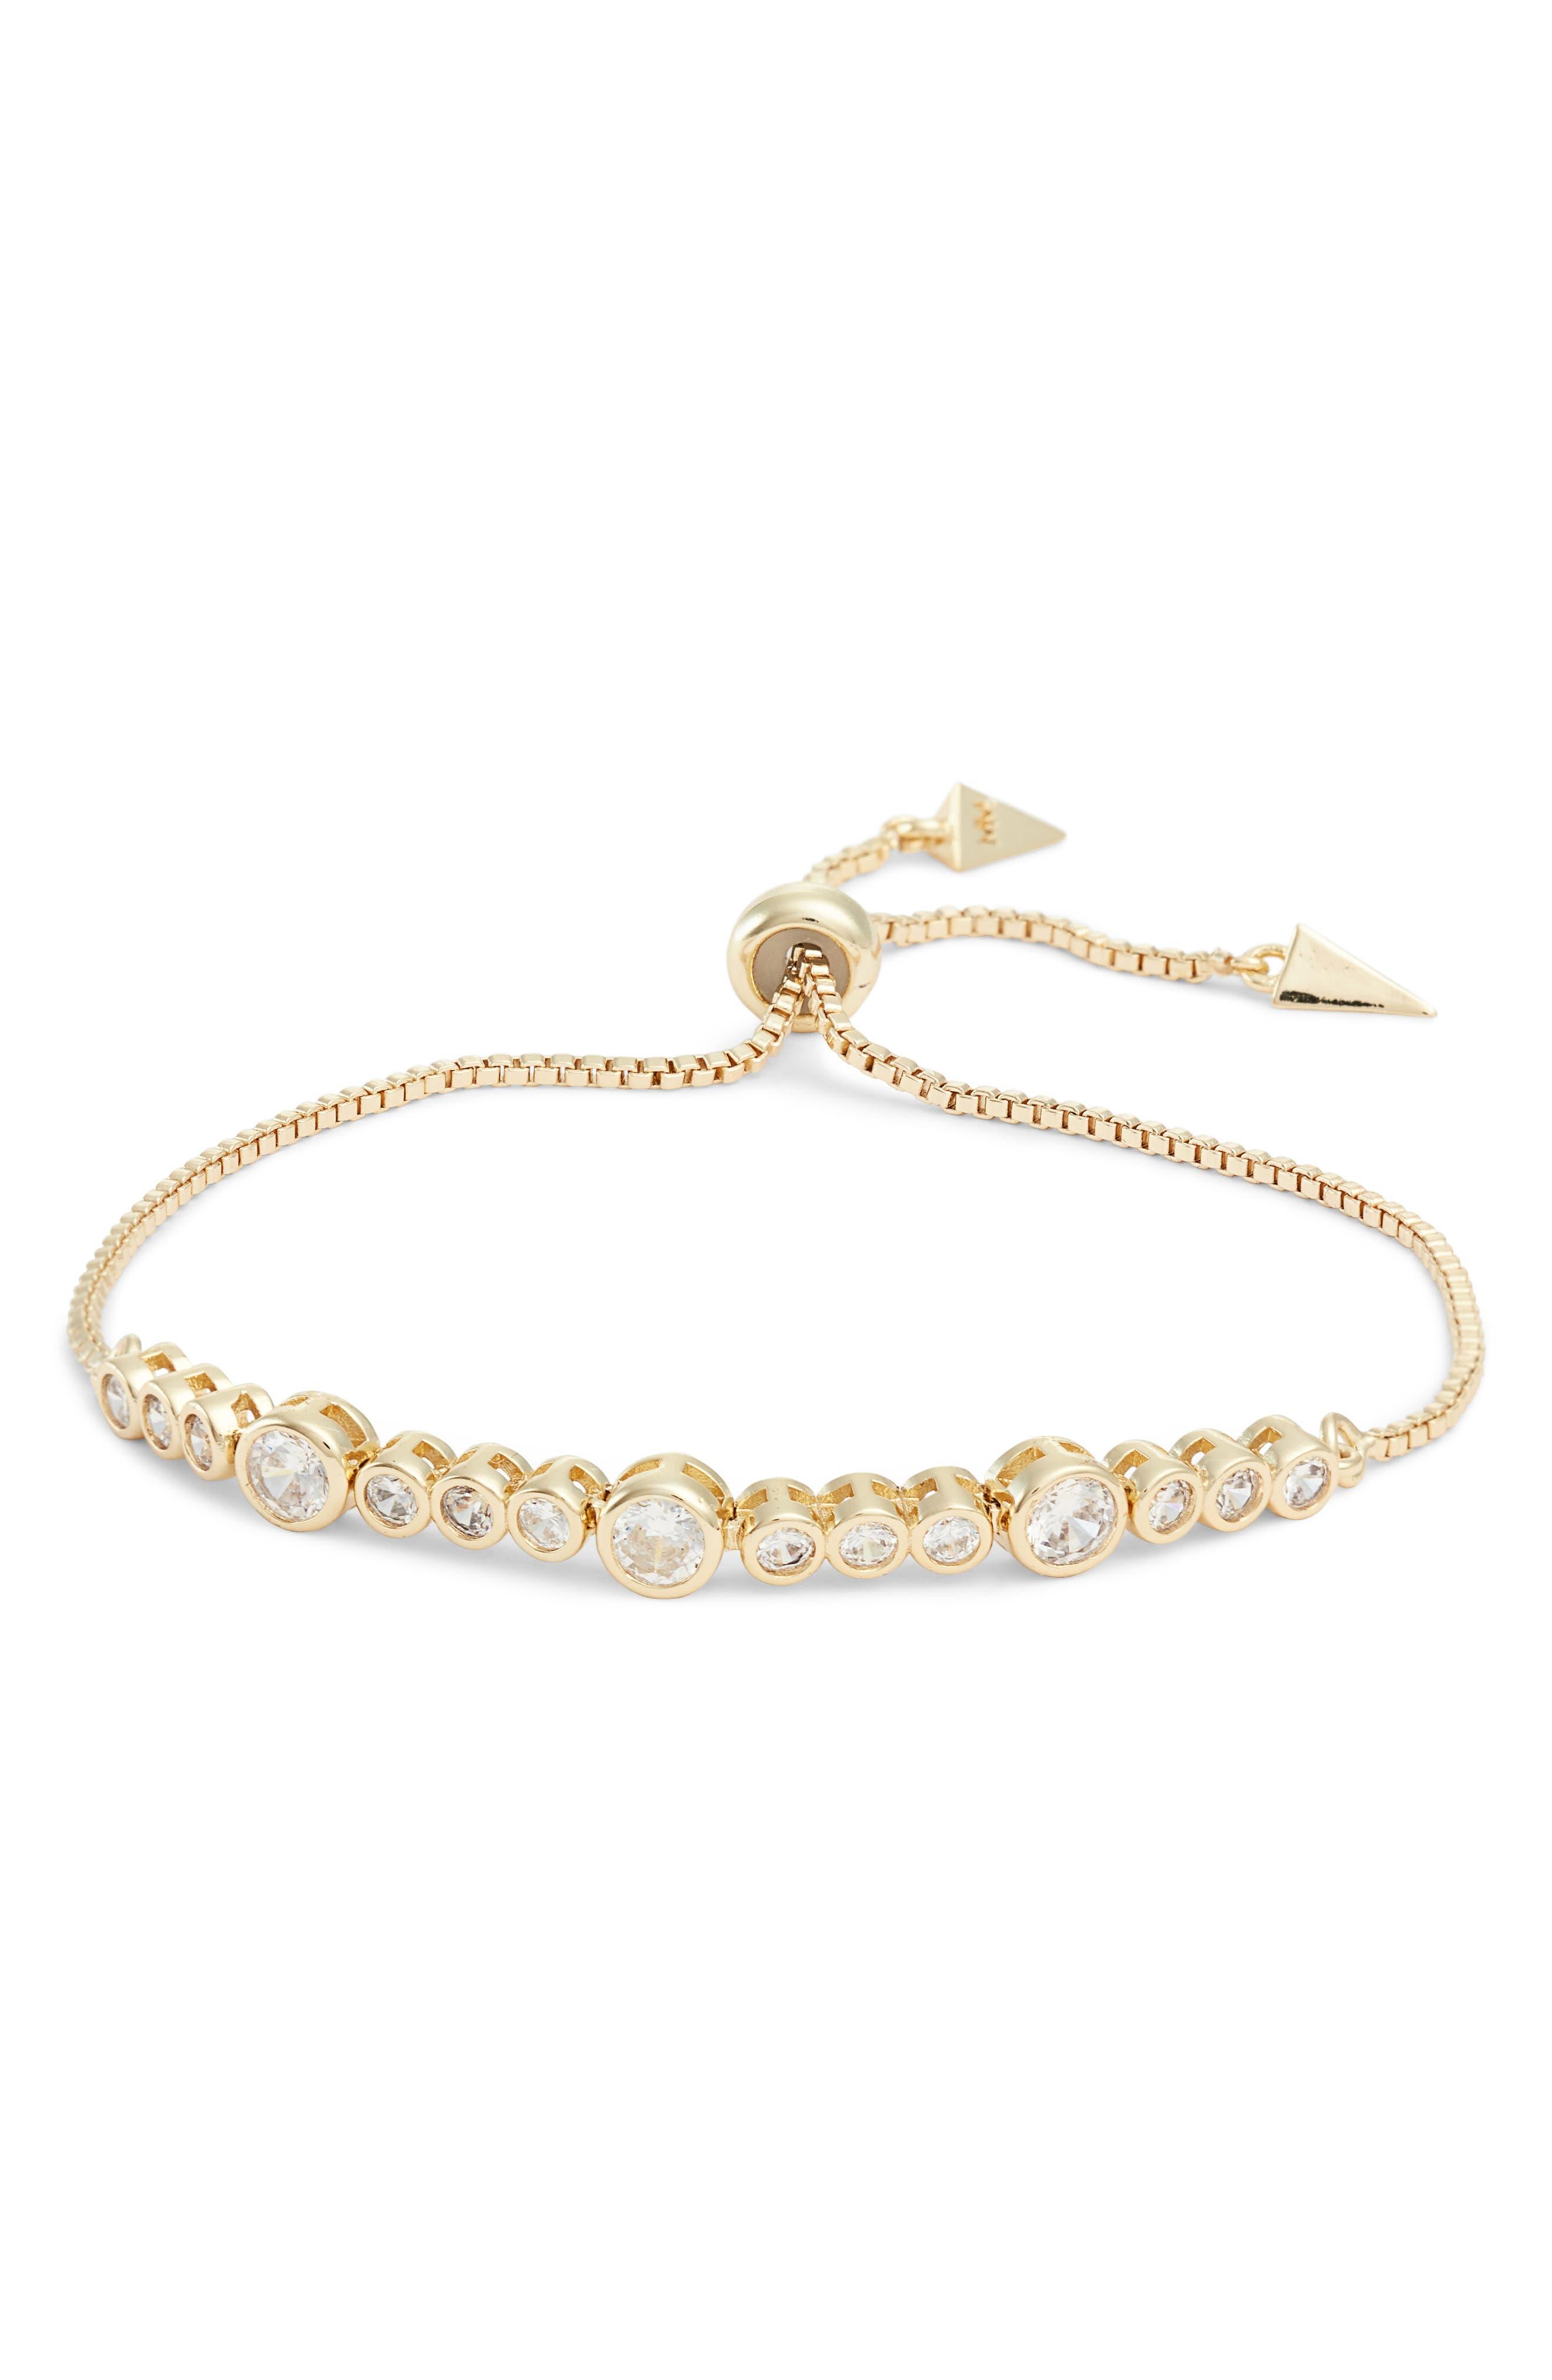 MELINDA MARIA Allison Bracelet in White Opal/ White Cz/ Gold